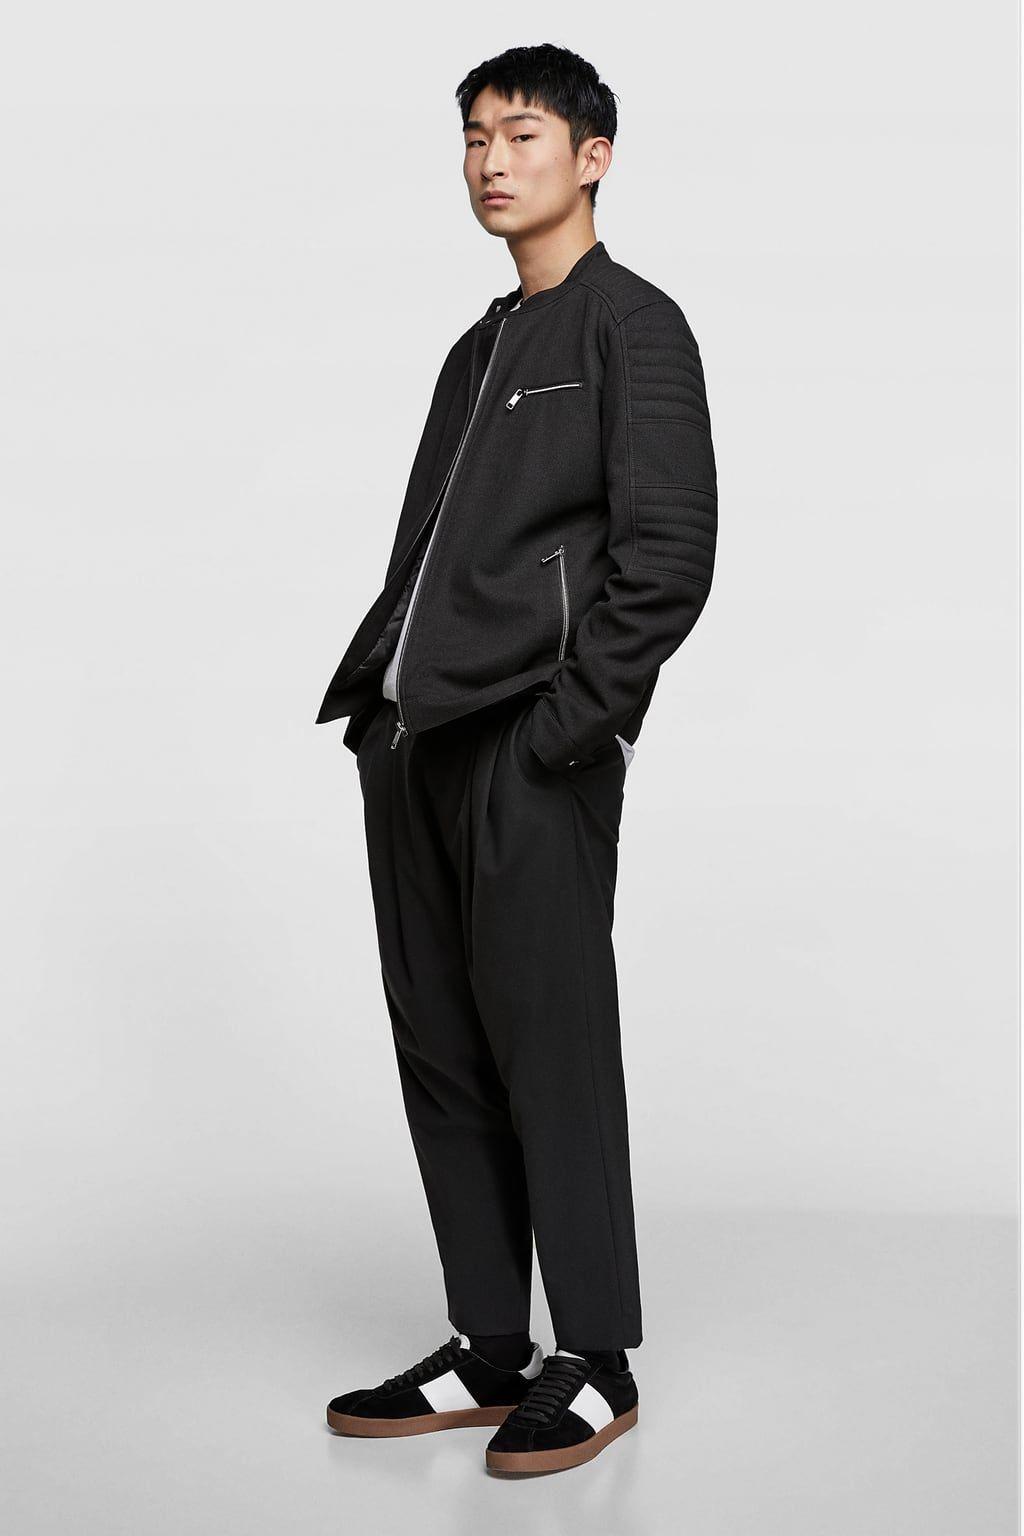 d66d3396 Piqué biker jacket | stuff to buy 2 | Zara jackets, Fashion, Jackets